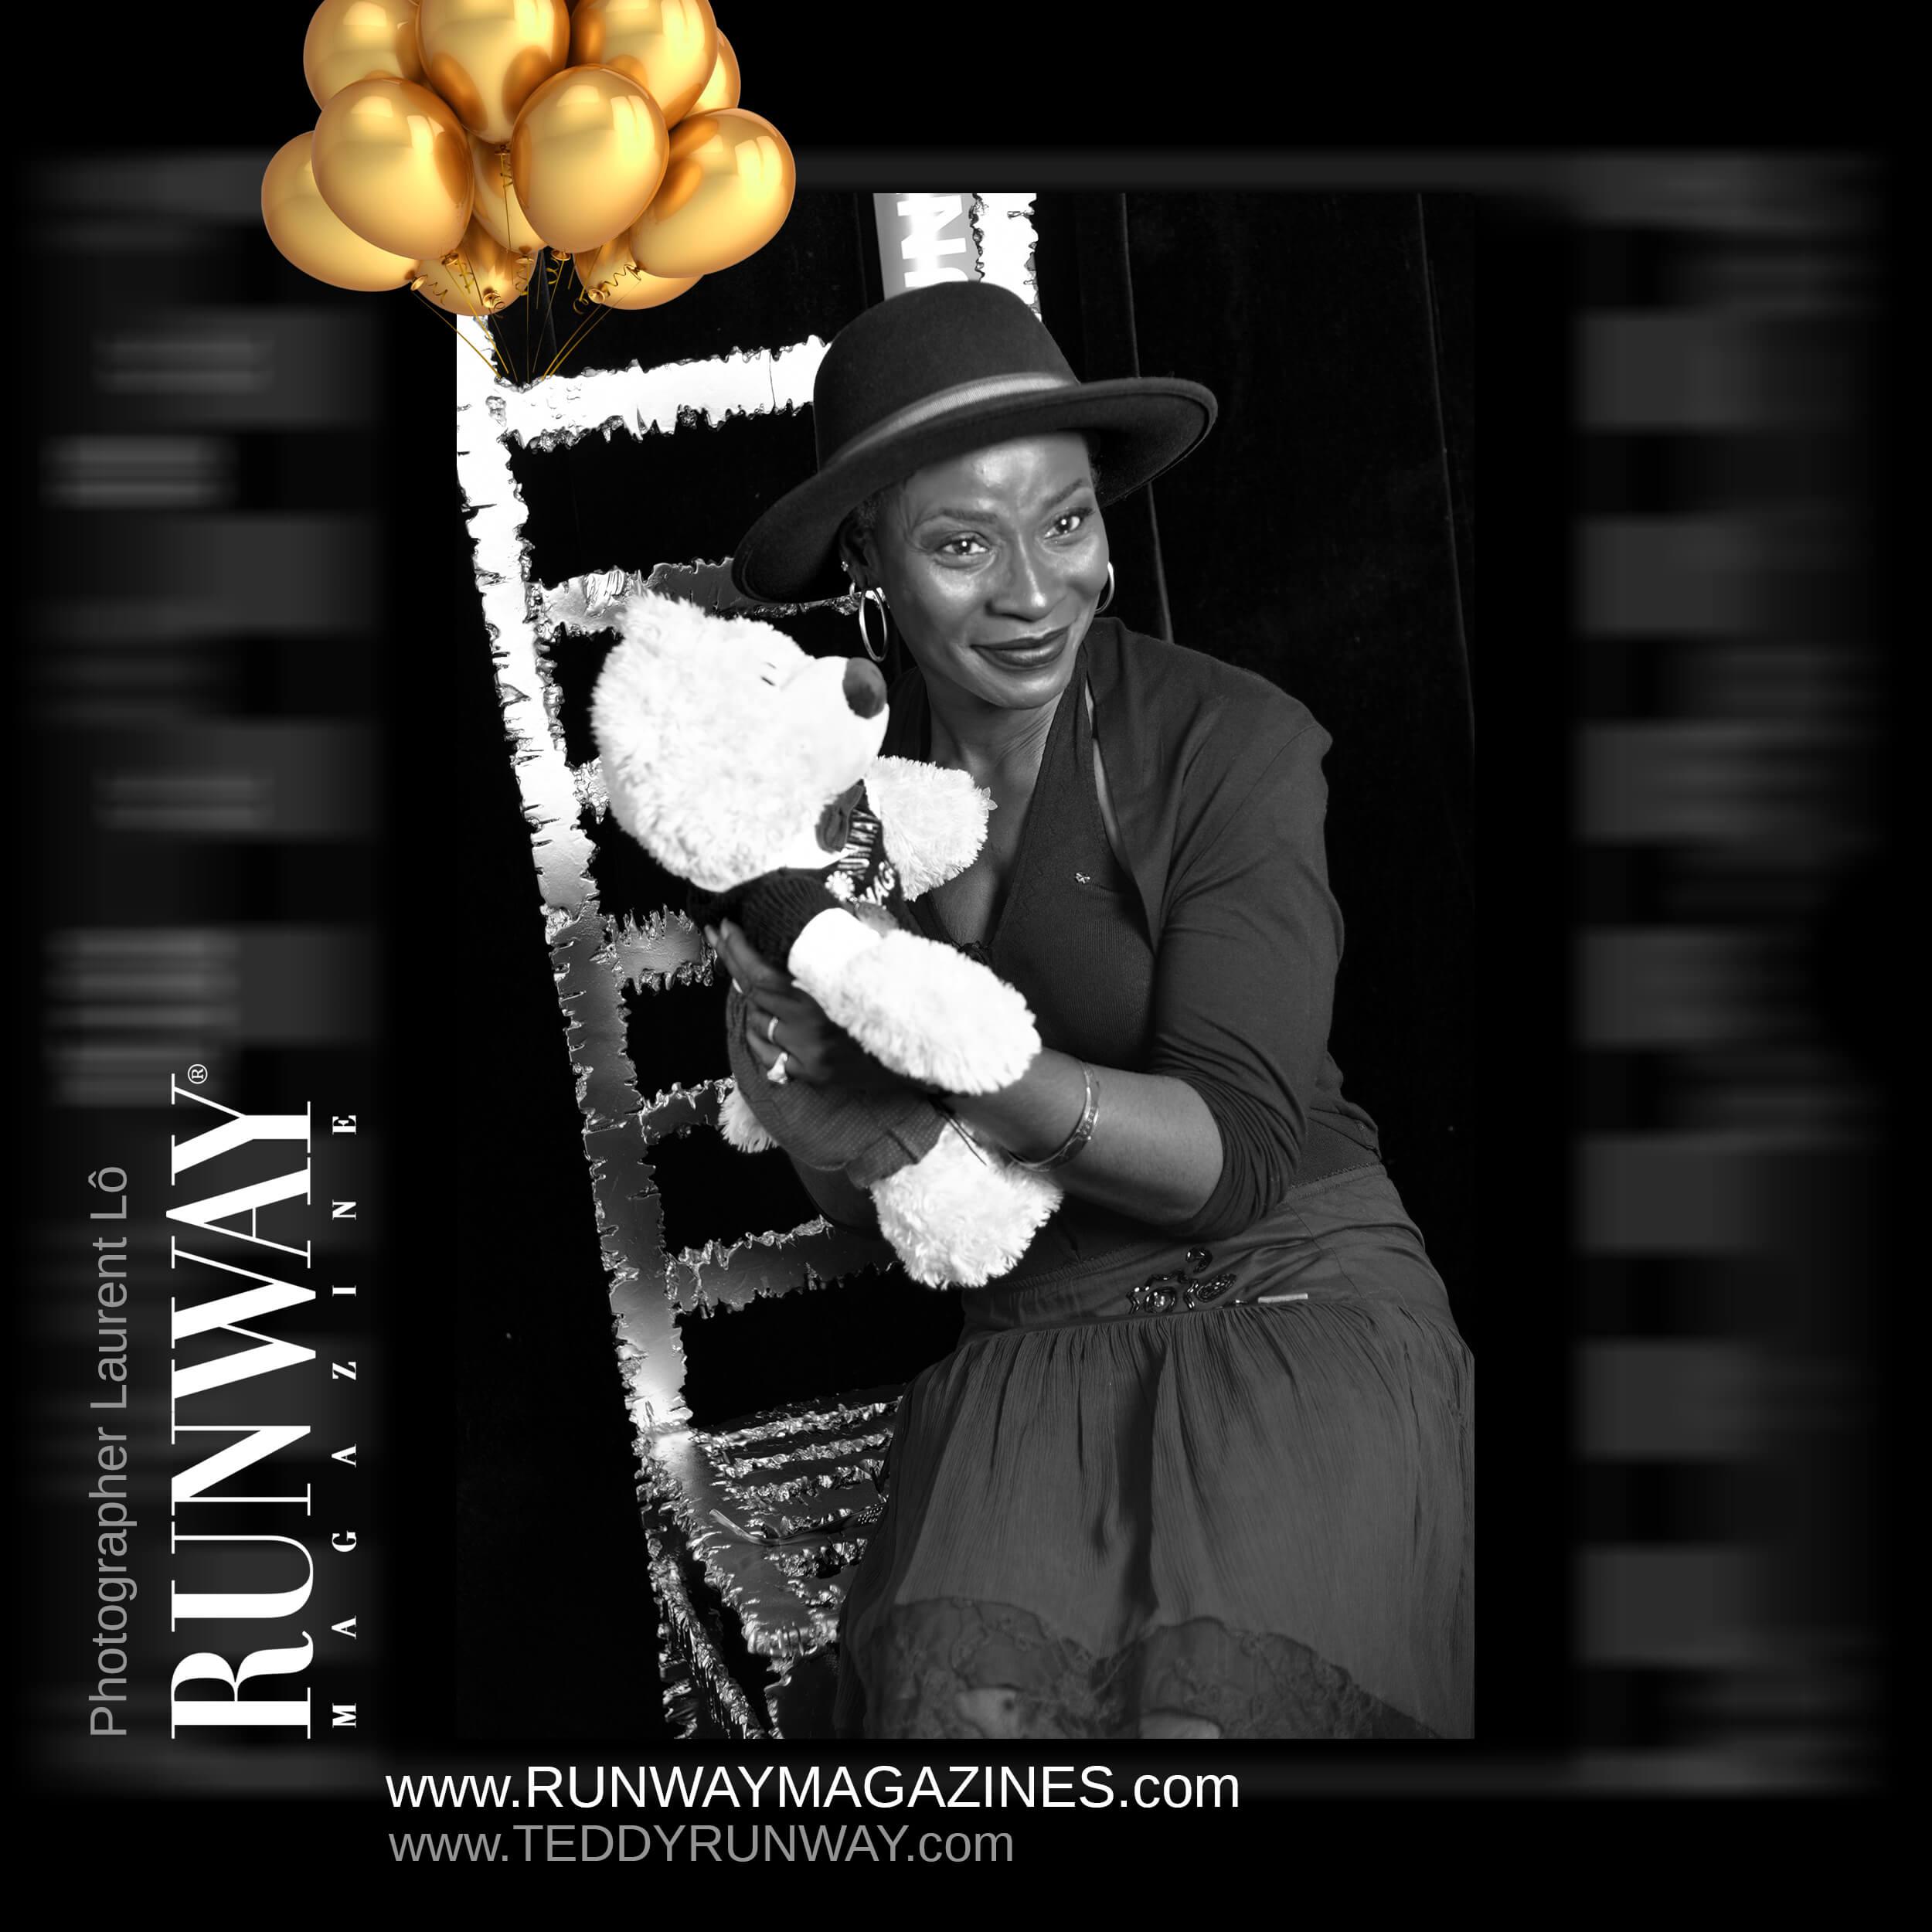 Teddy Runway Журнал Official Party. Runway Журнал Официальная вечеринка